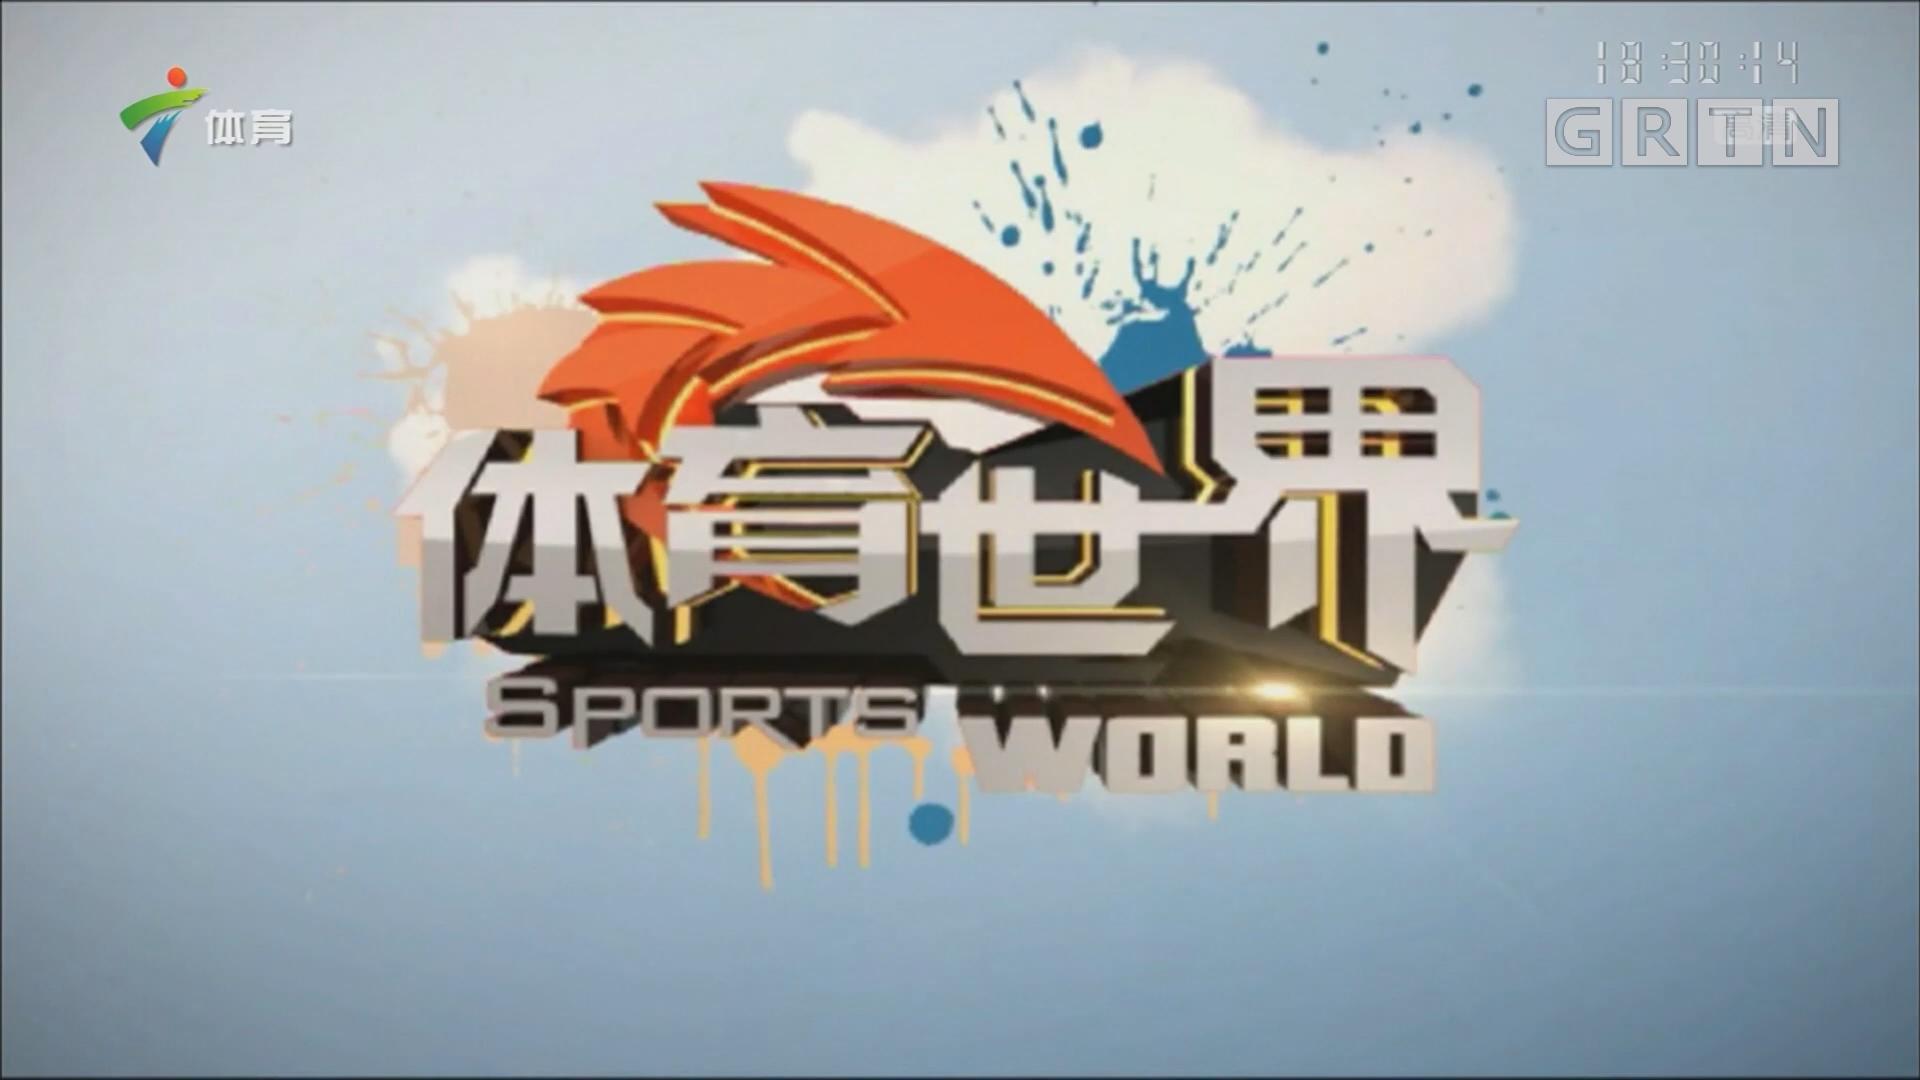 [HD][2018-01-07]体育世界:平昌冬奥会火炬在龙仁市继续传递